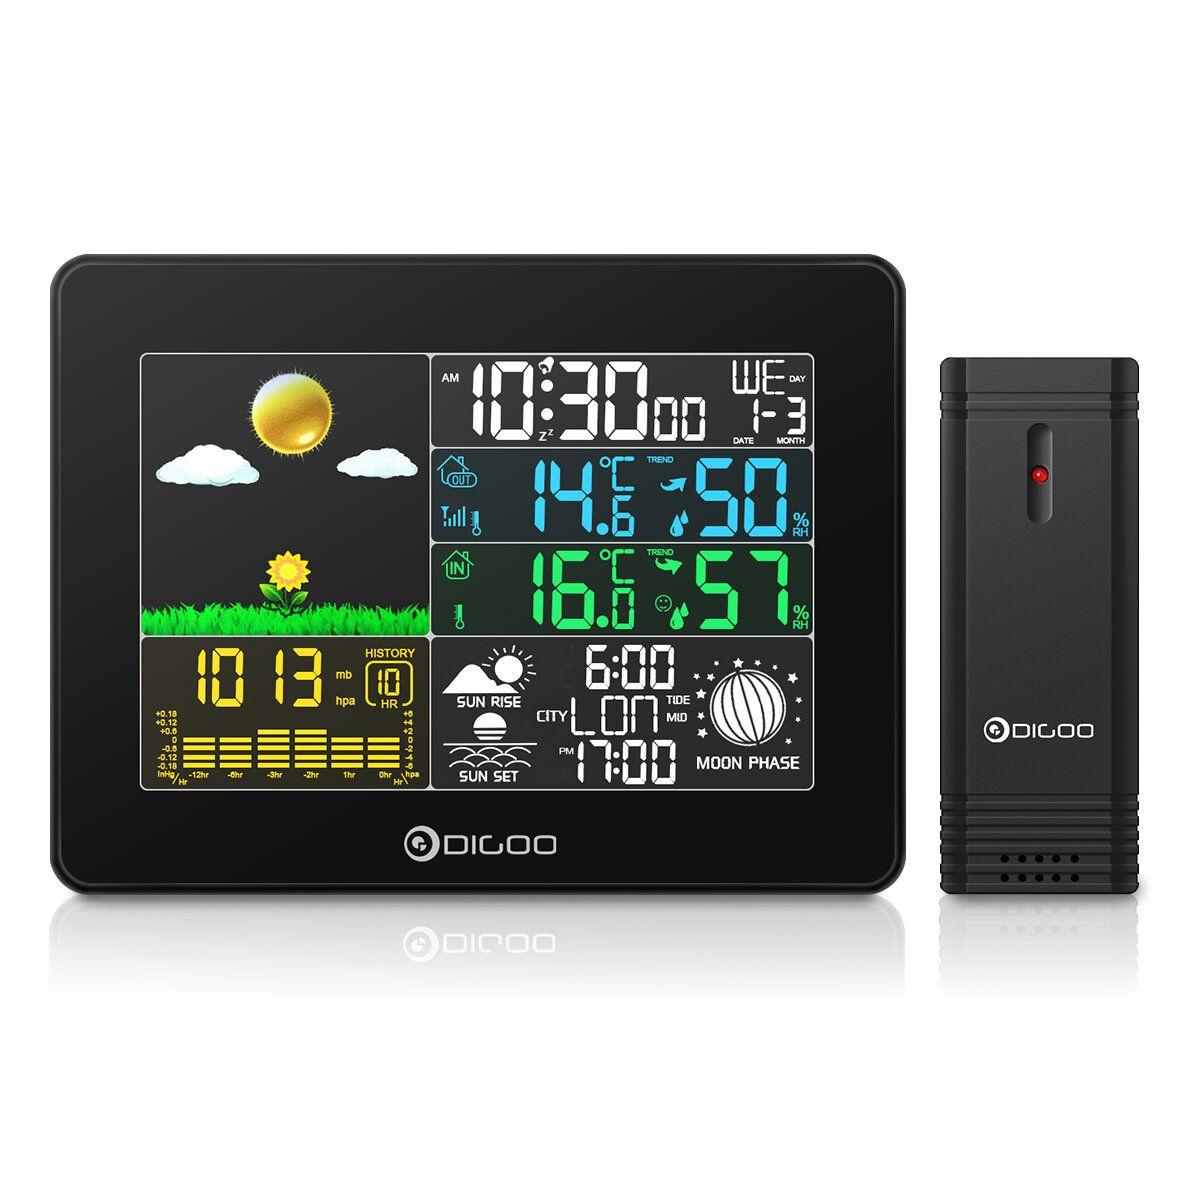 KEK US$28.27 DIGOO Wireless Full-Color Screen Digital USB Outdoor Barometric Pressure Weather Station Smart Home Hygrometer Thermometer Forecast Sensor